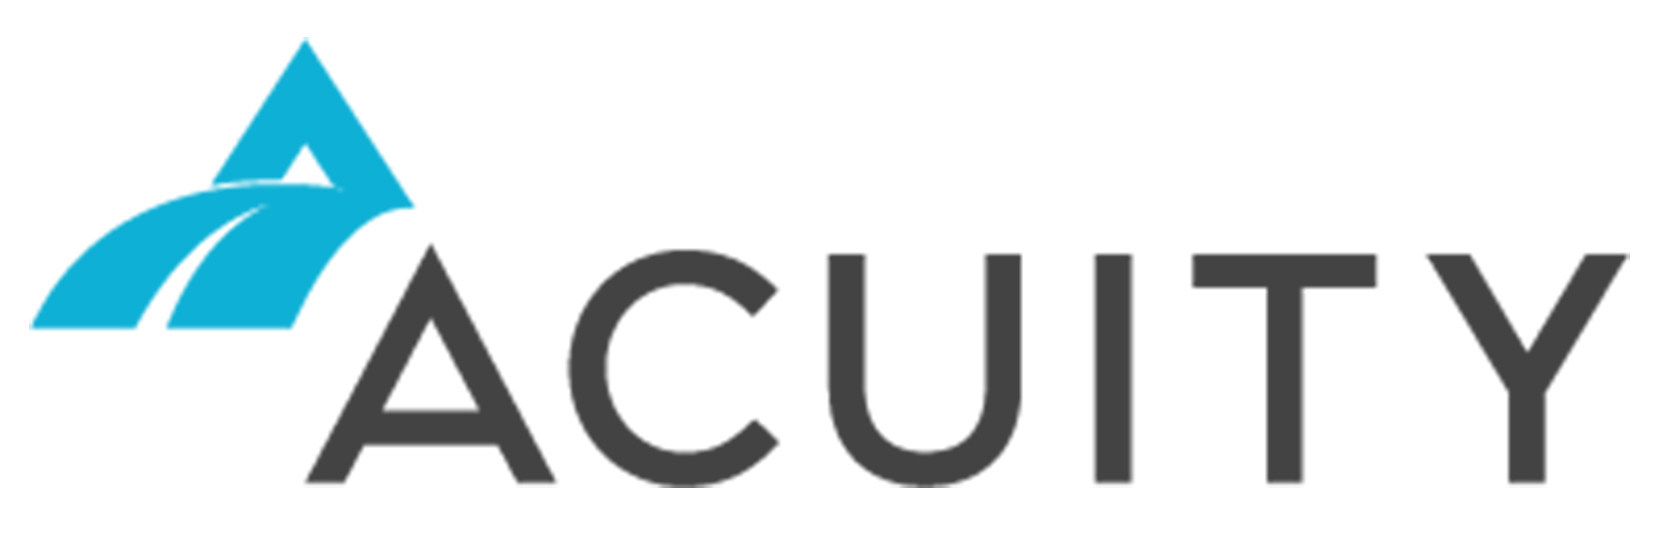 Accounting Firm Among Atlanta Business Chronicle's 2017 ...